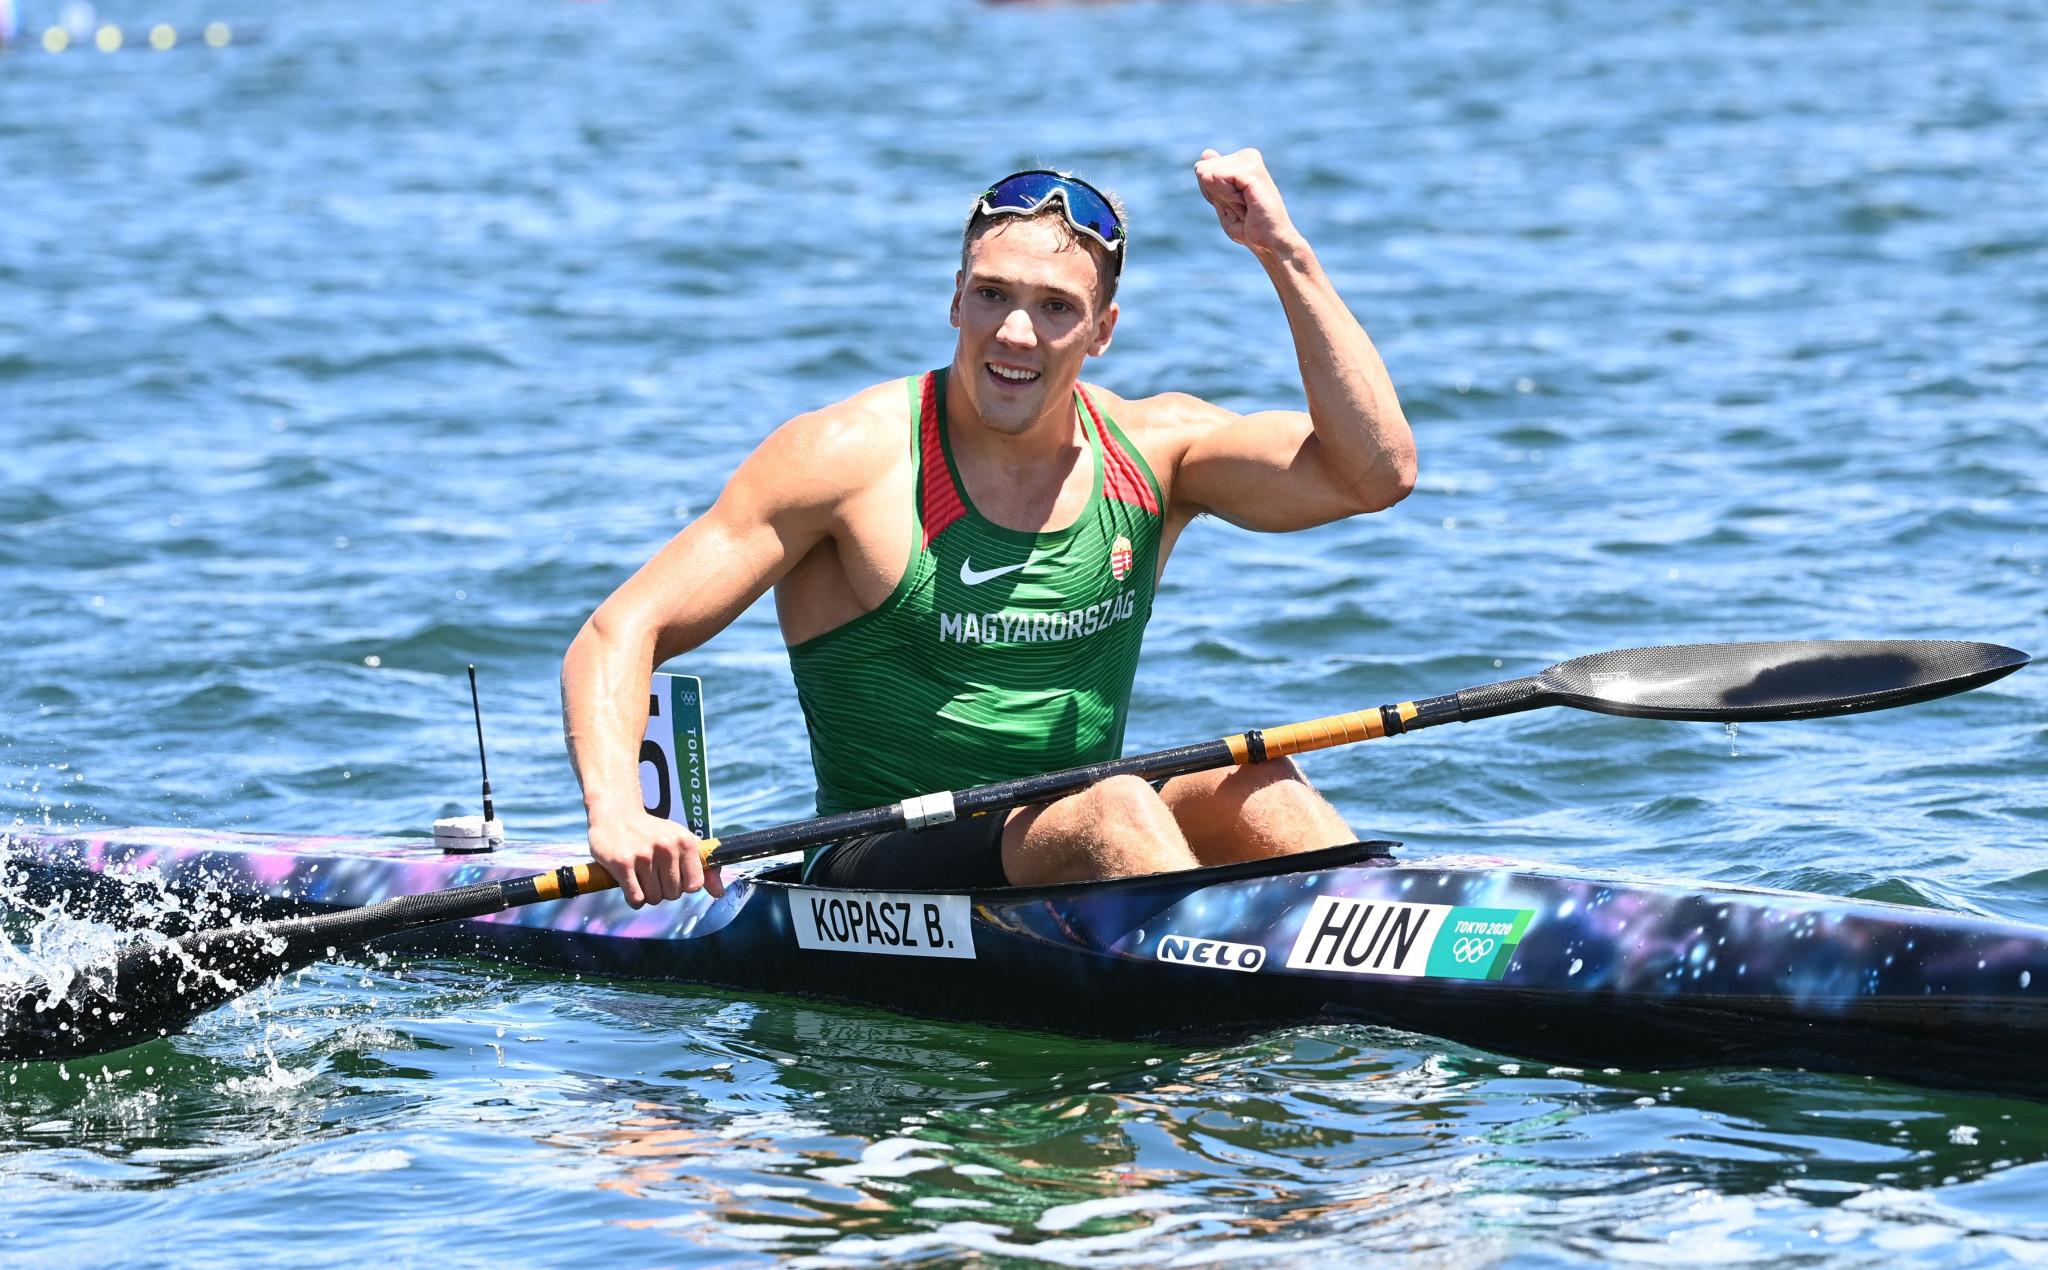 Olympic medallists Jørgensen and Kopasz ease through heats at ICF Canoe Sprint World Championships